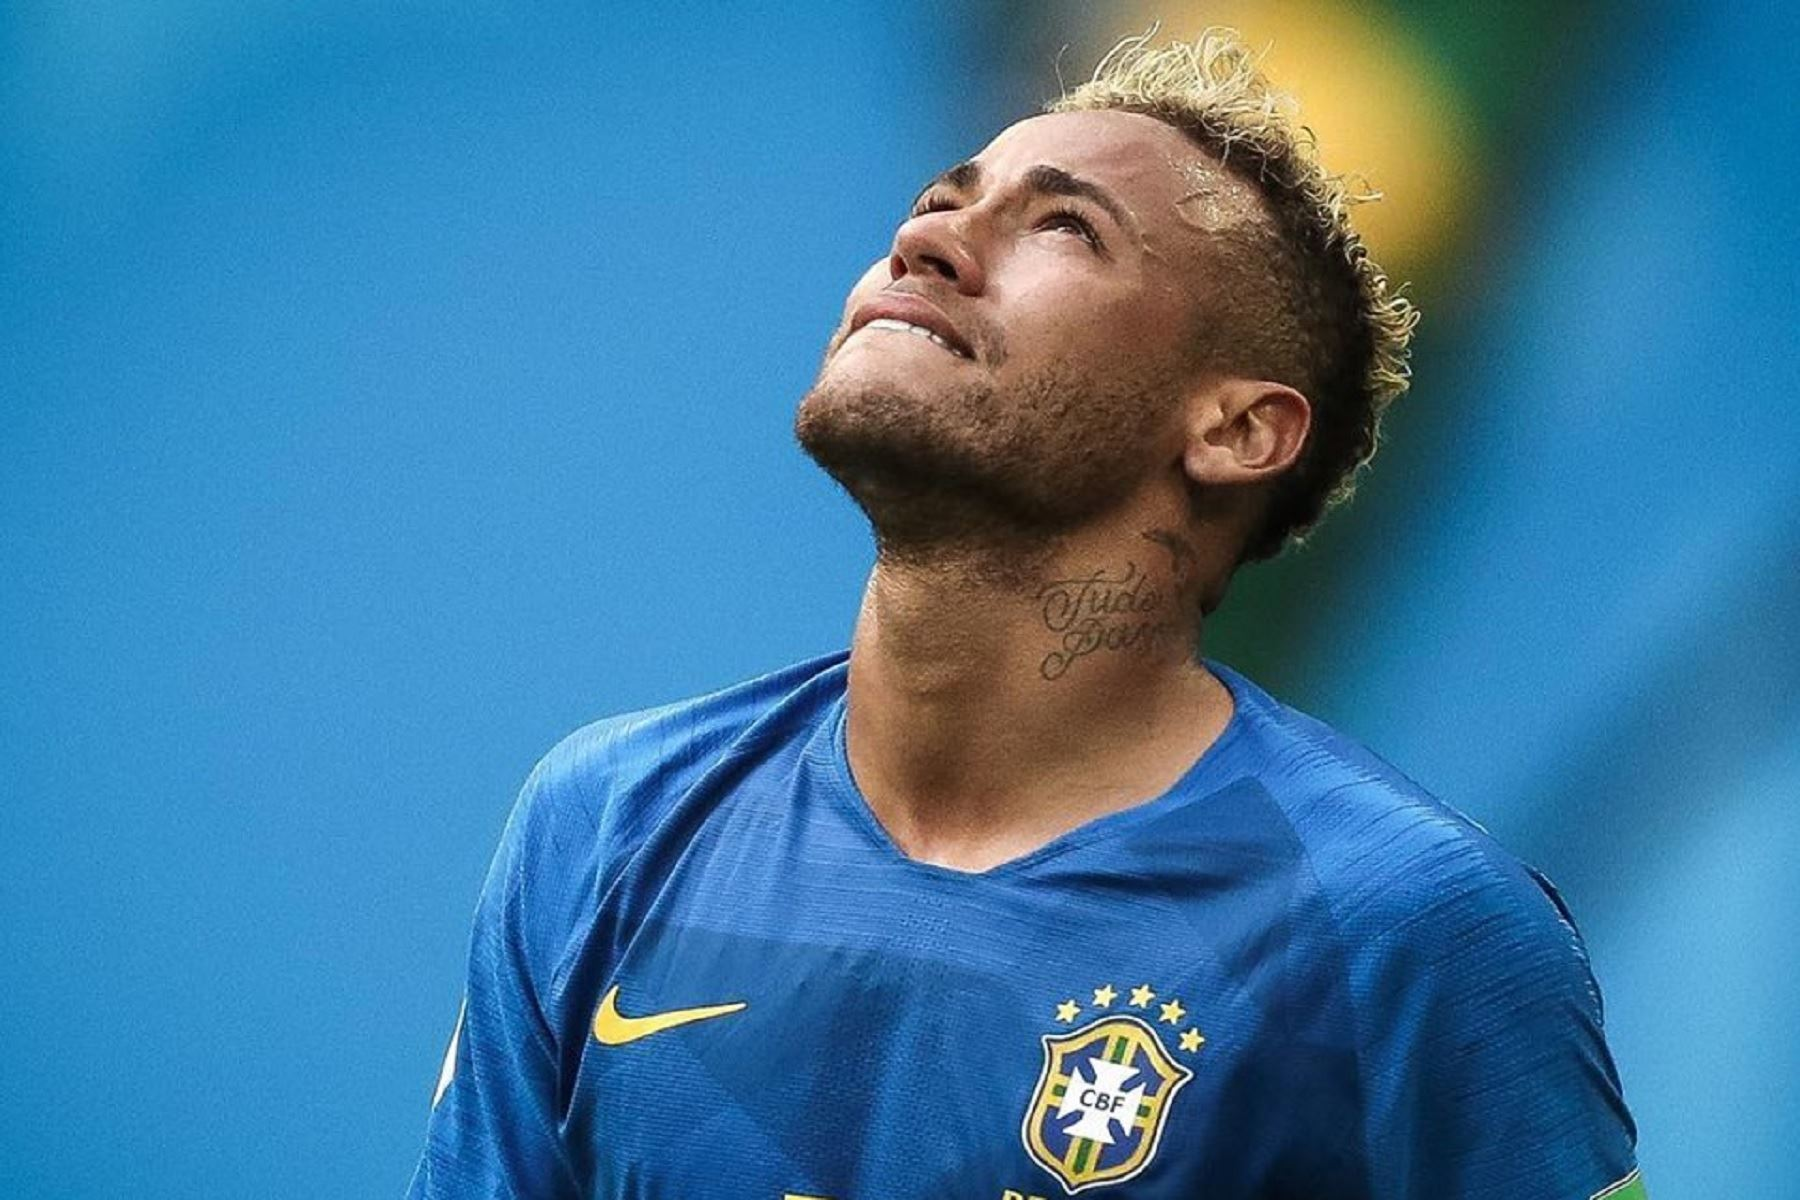 Neymar quiere salir del PSG. Foto: Facebook/Neymar